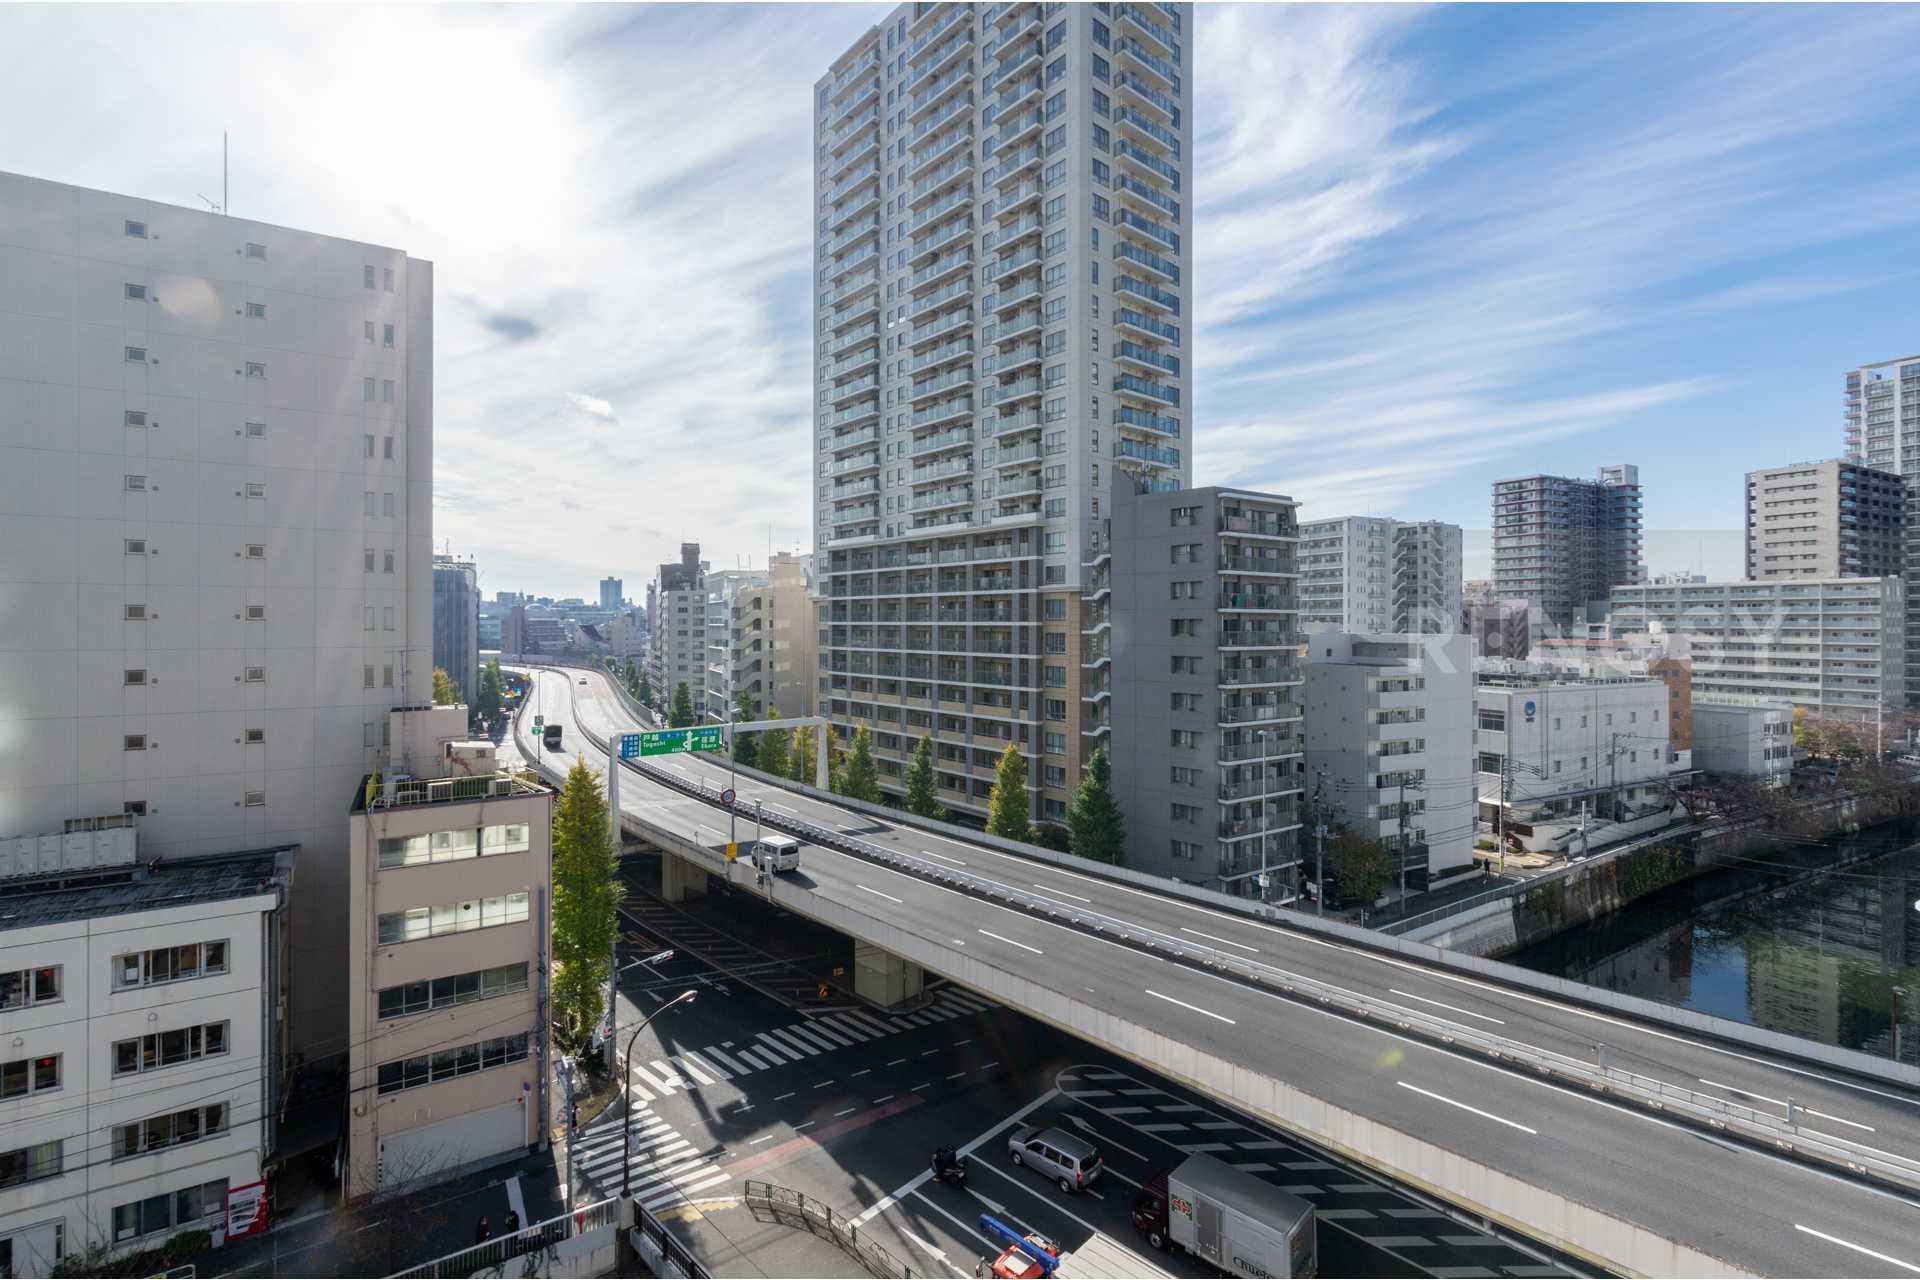 41_【ldd3_sell】五反田リーラハイタウン903号室_20201202195928.jpg